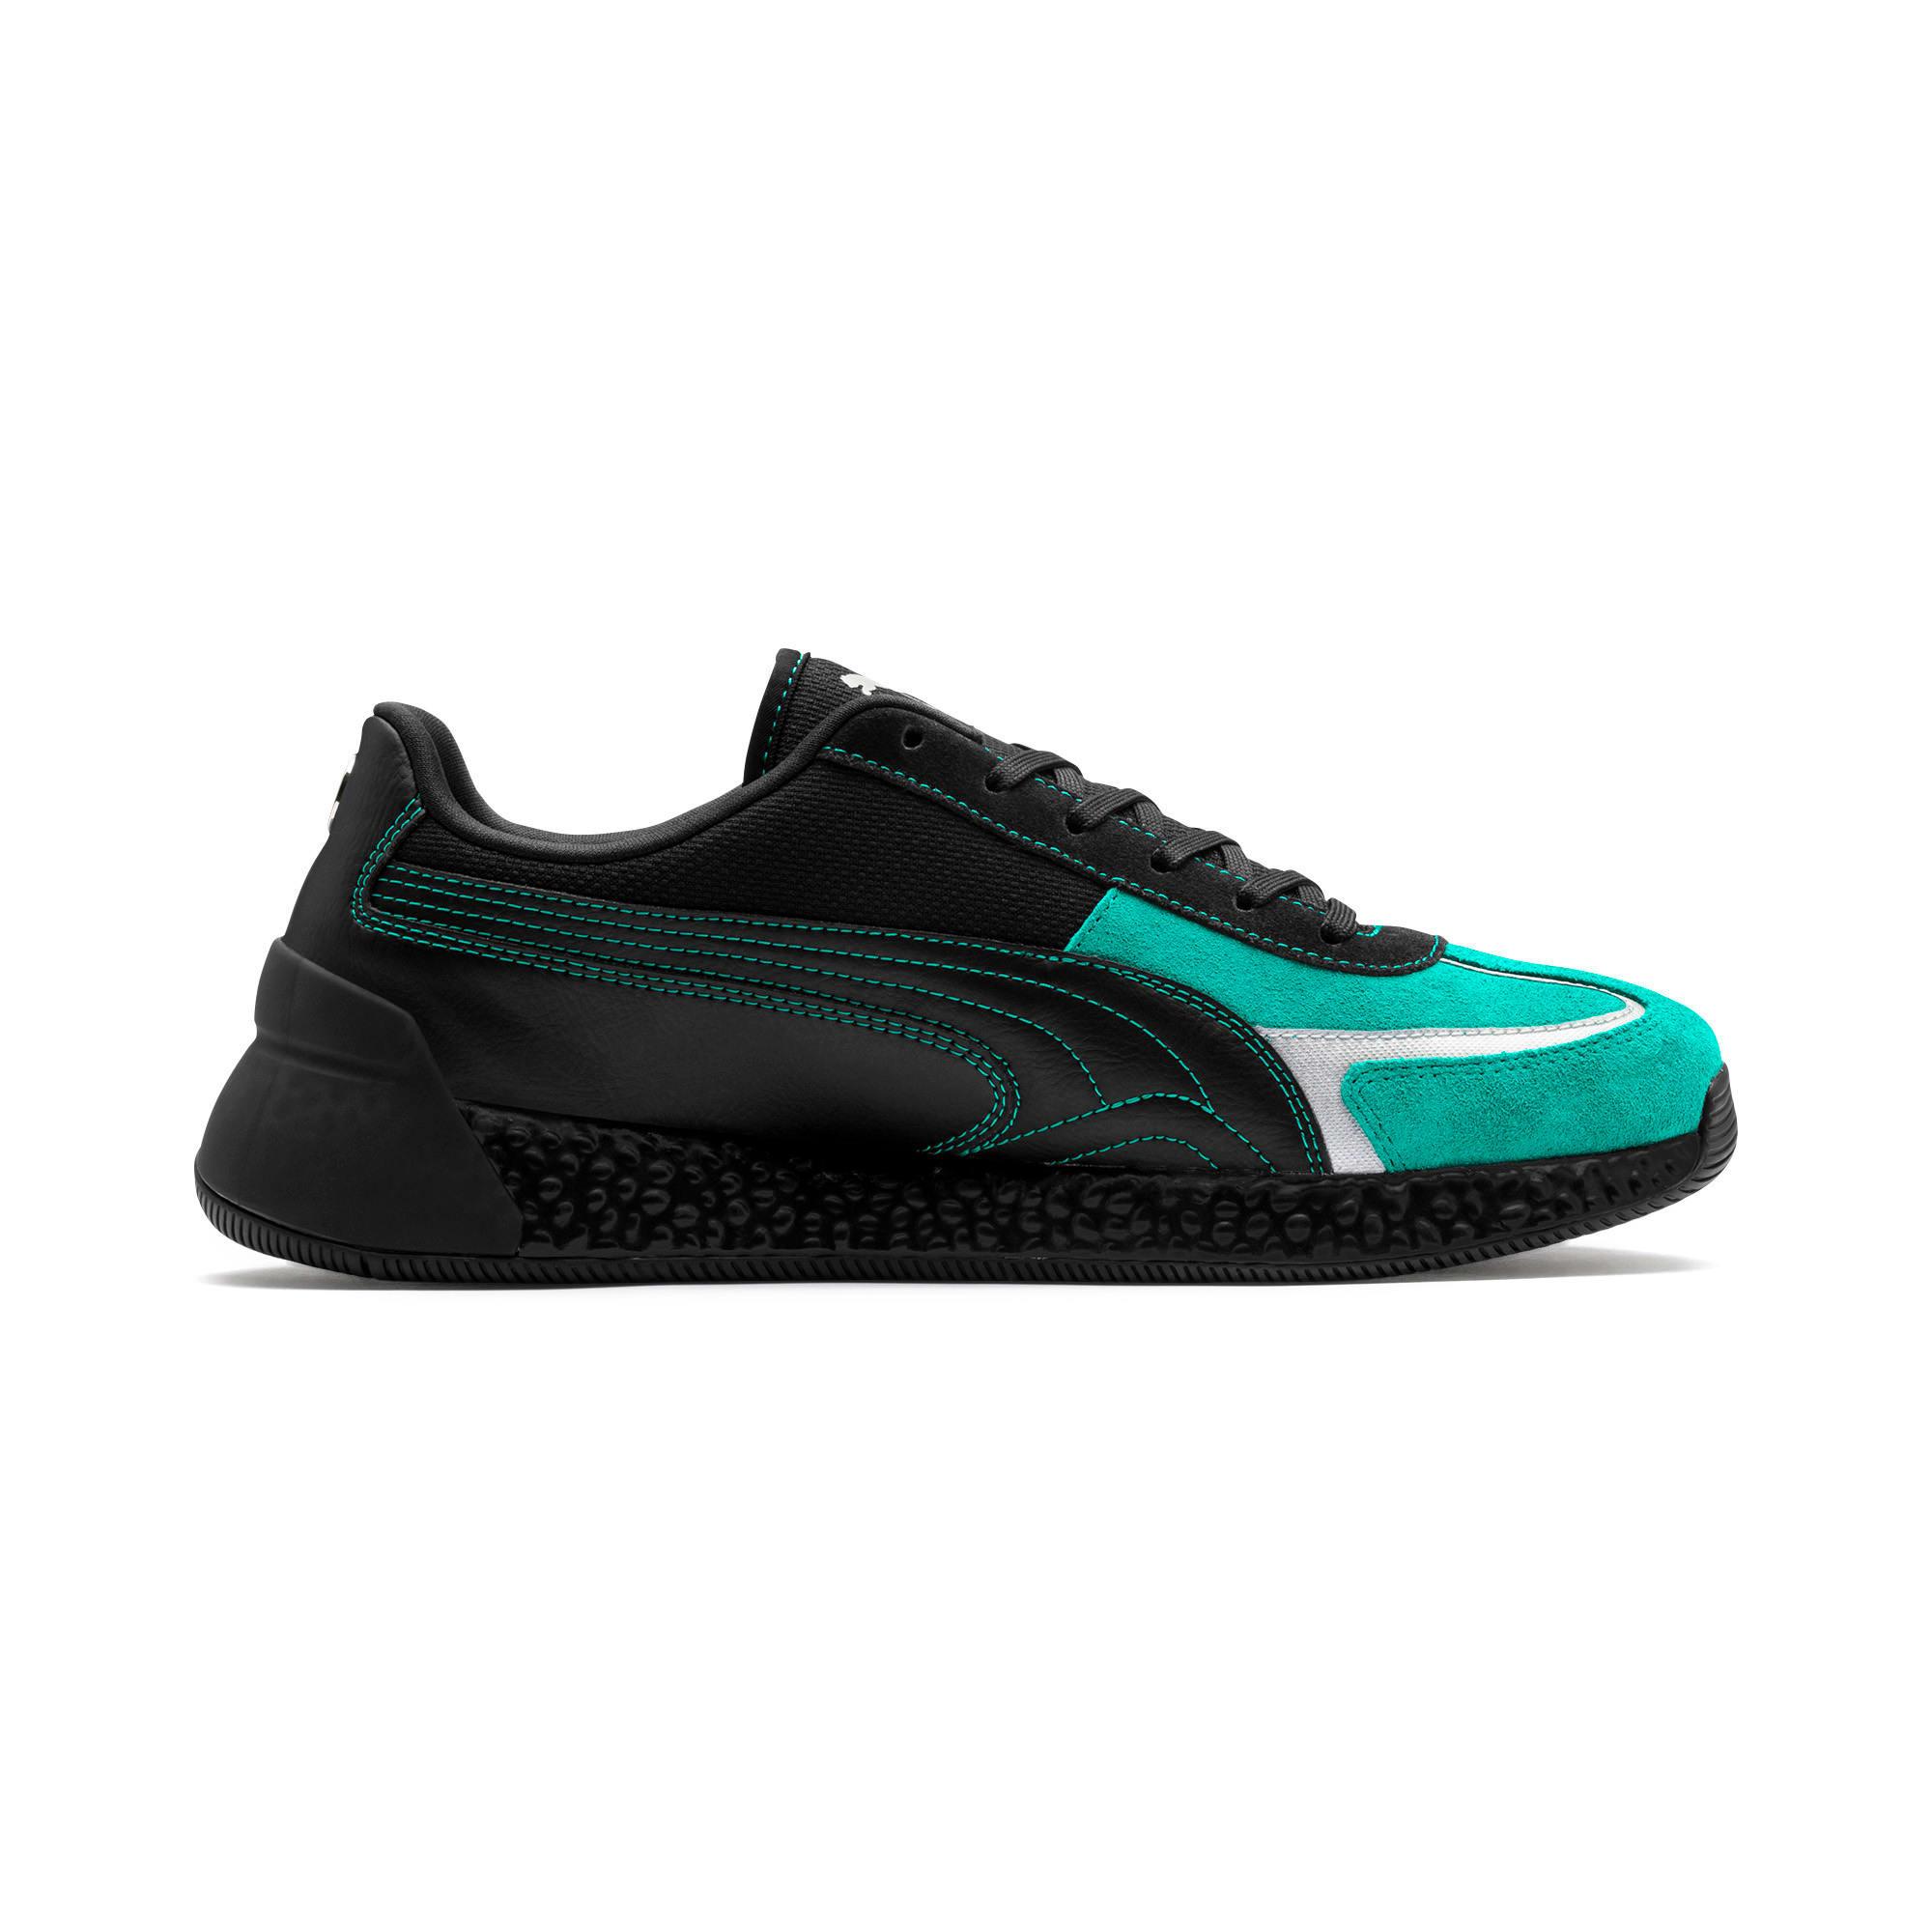 Thumbnail 6 of Mercedes AMG Petronas Speed HYBRID Running Shoes, Puma Black-Spectra Green, medium